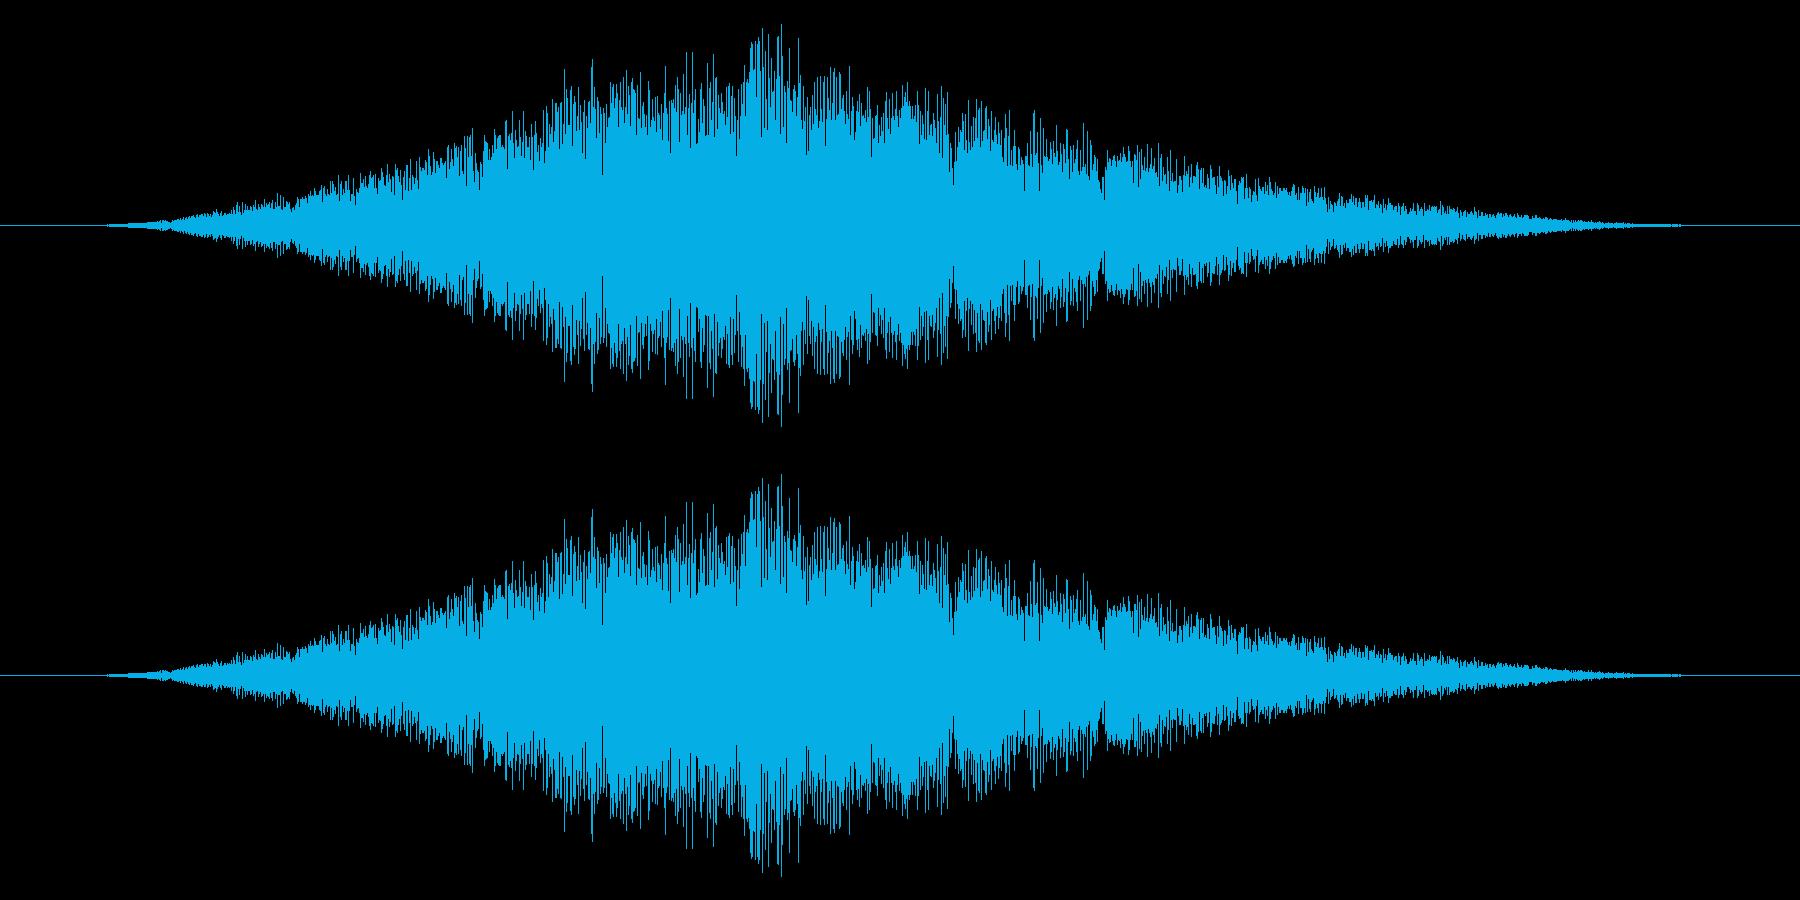 SNES レース02-03(通過)の再生済みの波形